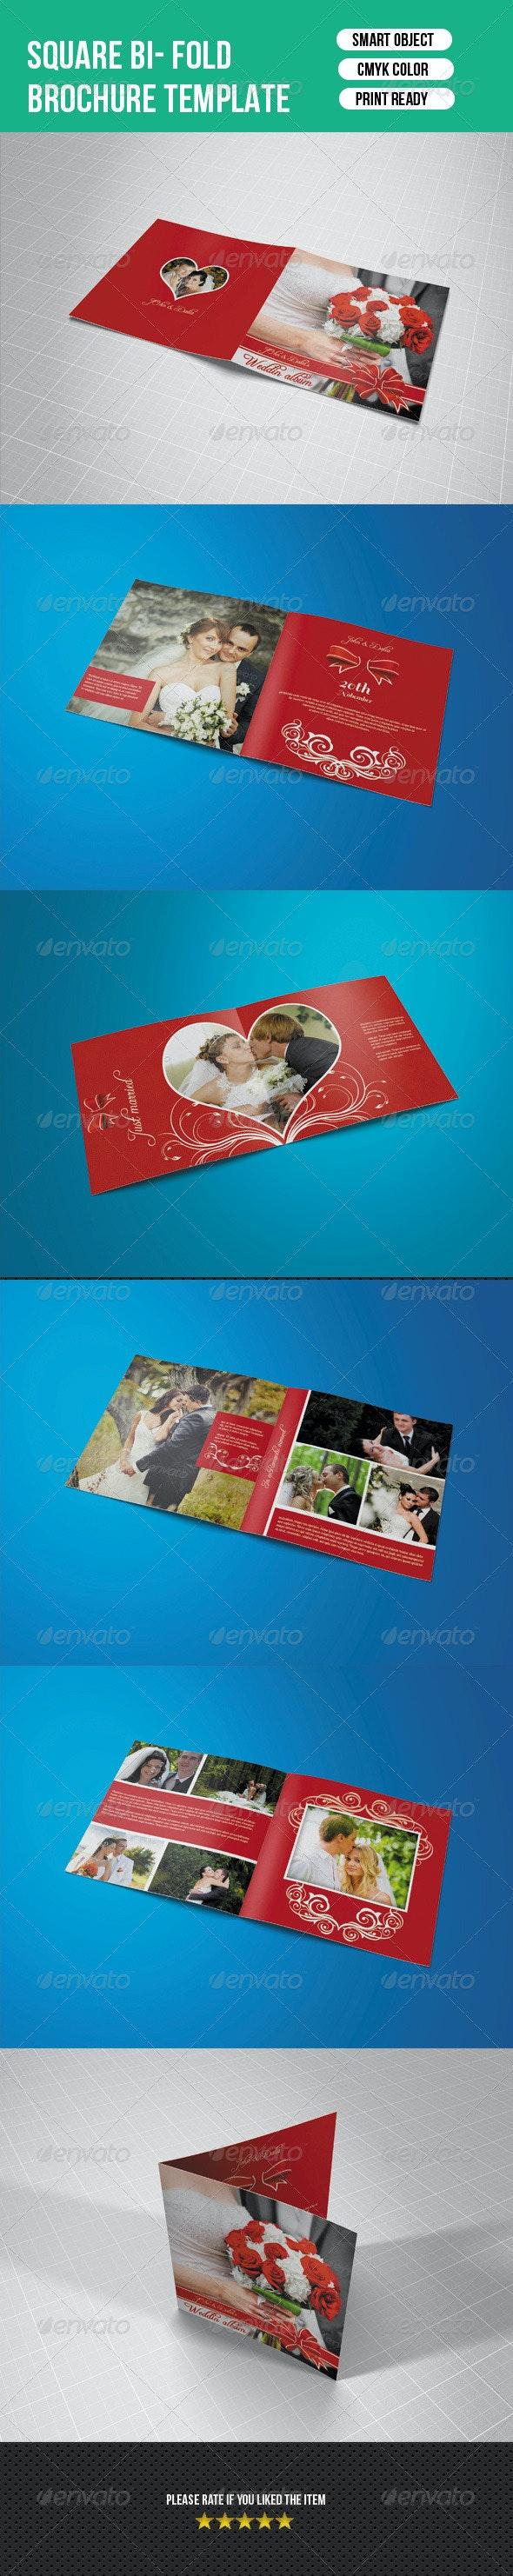 Square Photo Album-V02 - Photo Albums Print Templates